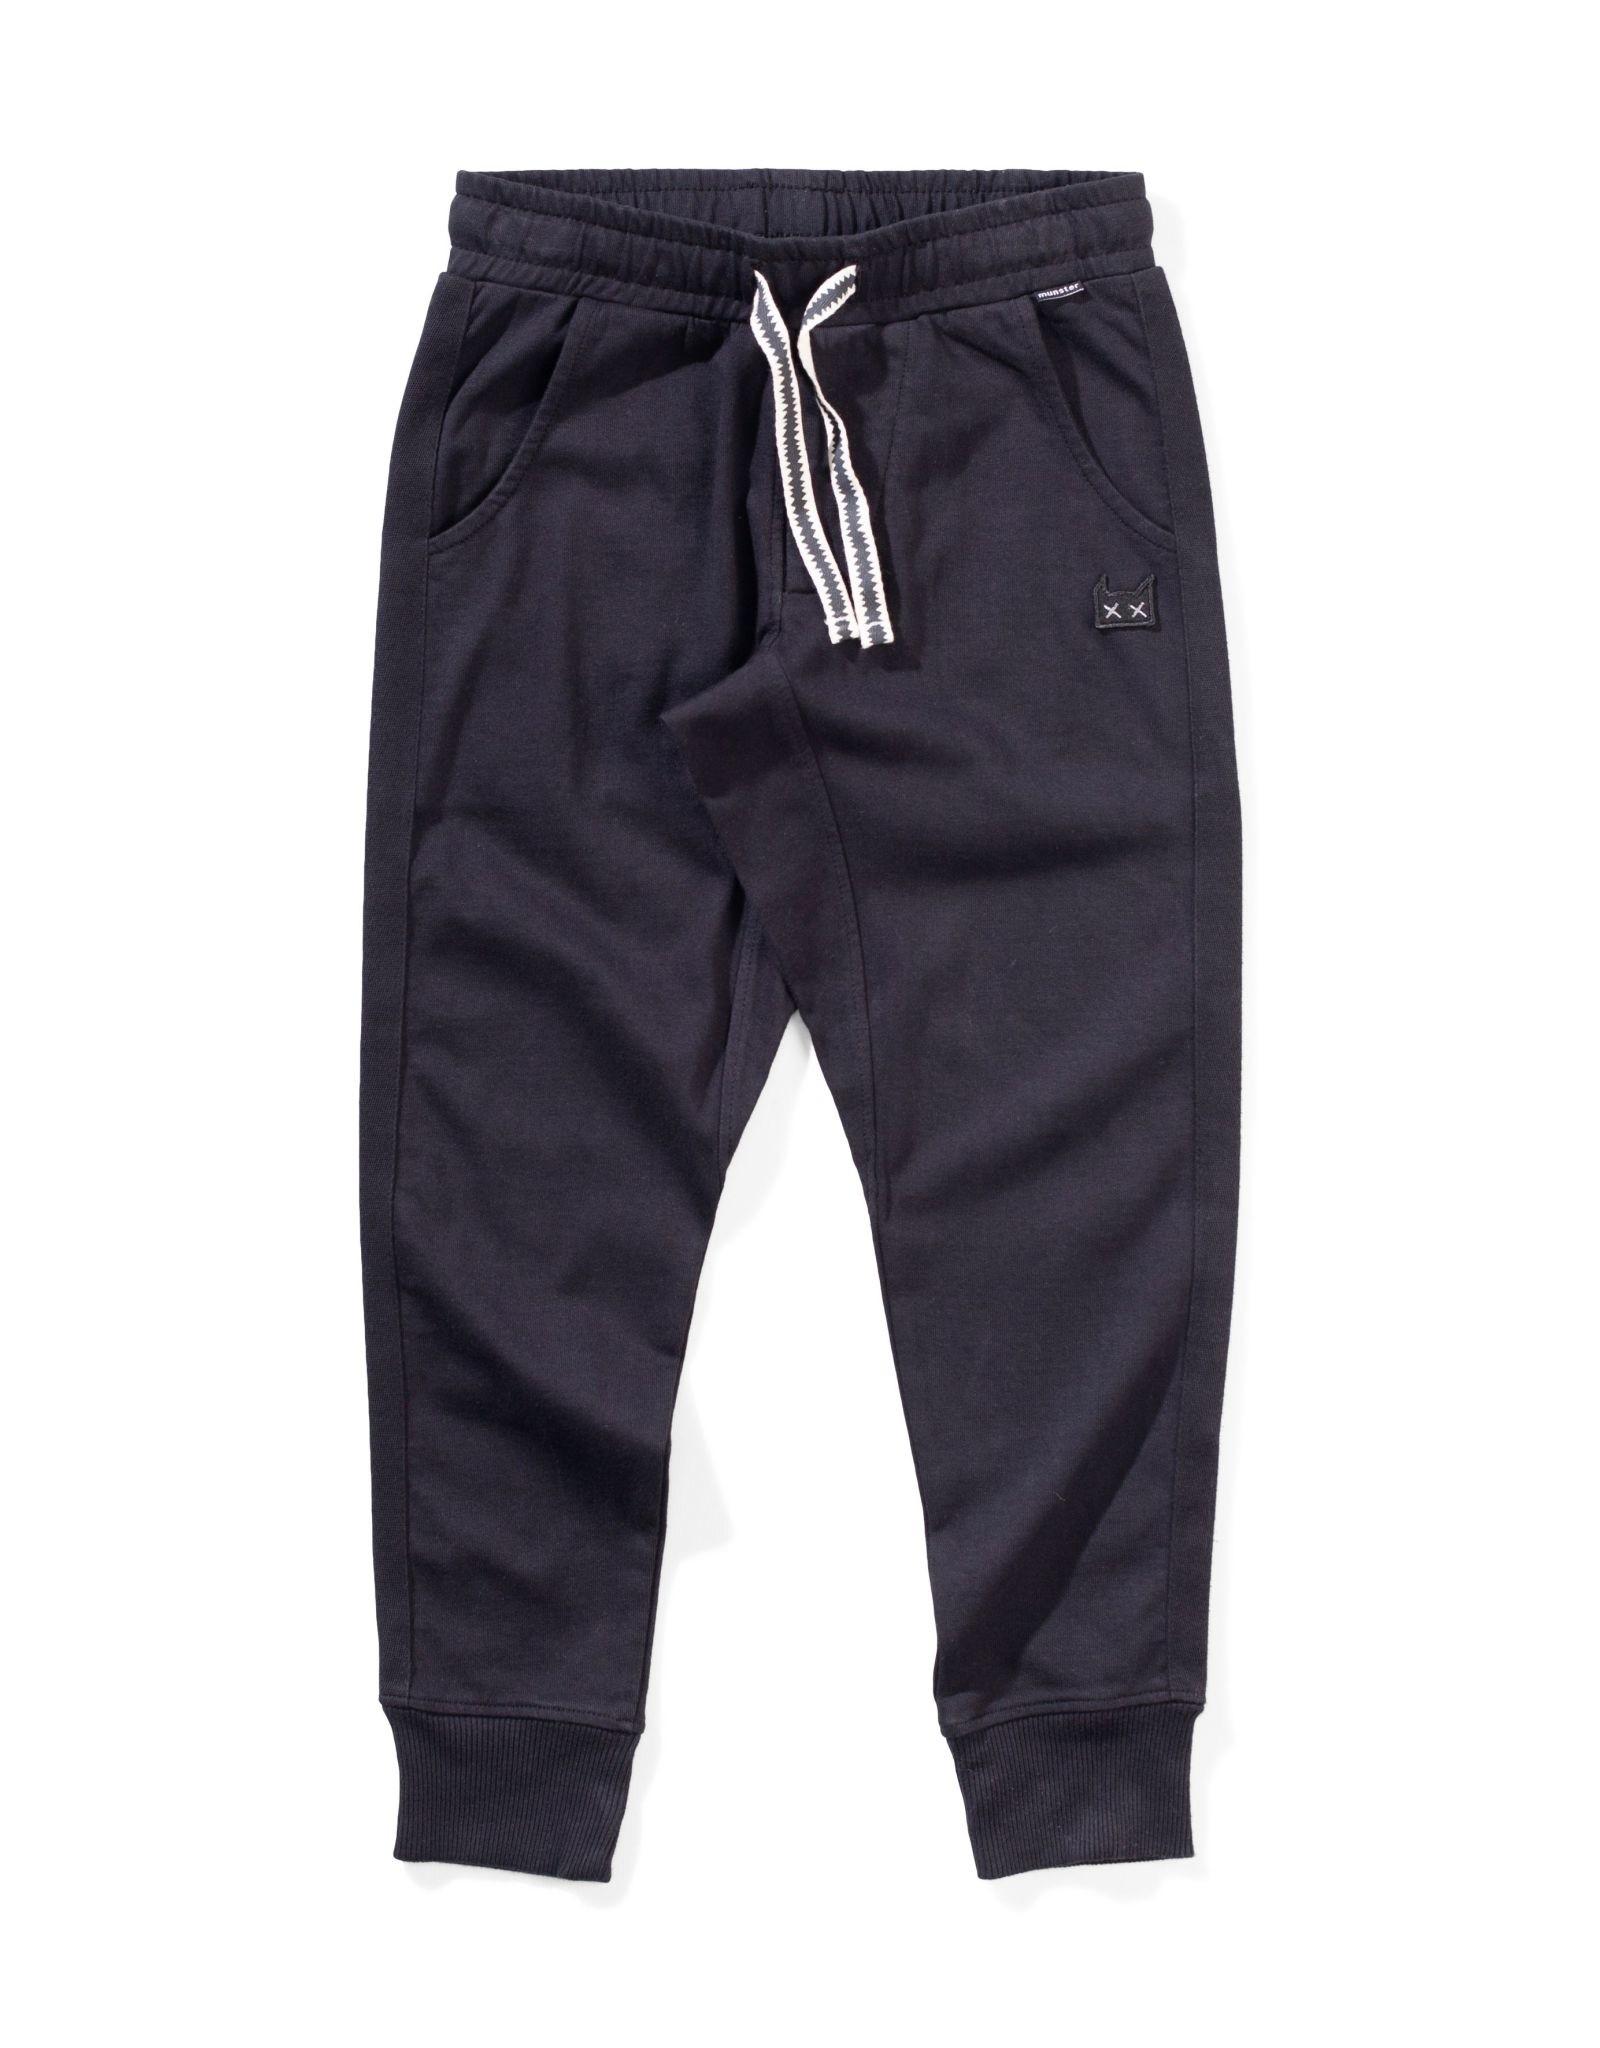 Munster Kids trackwear pant- black